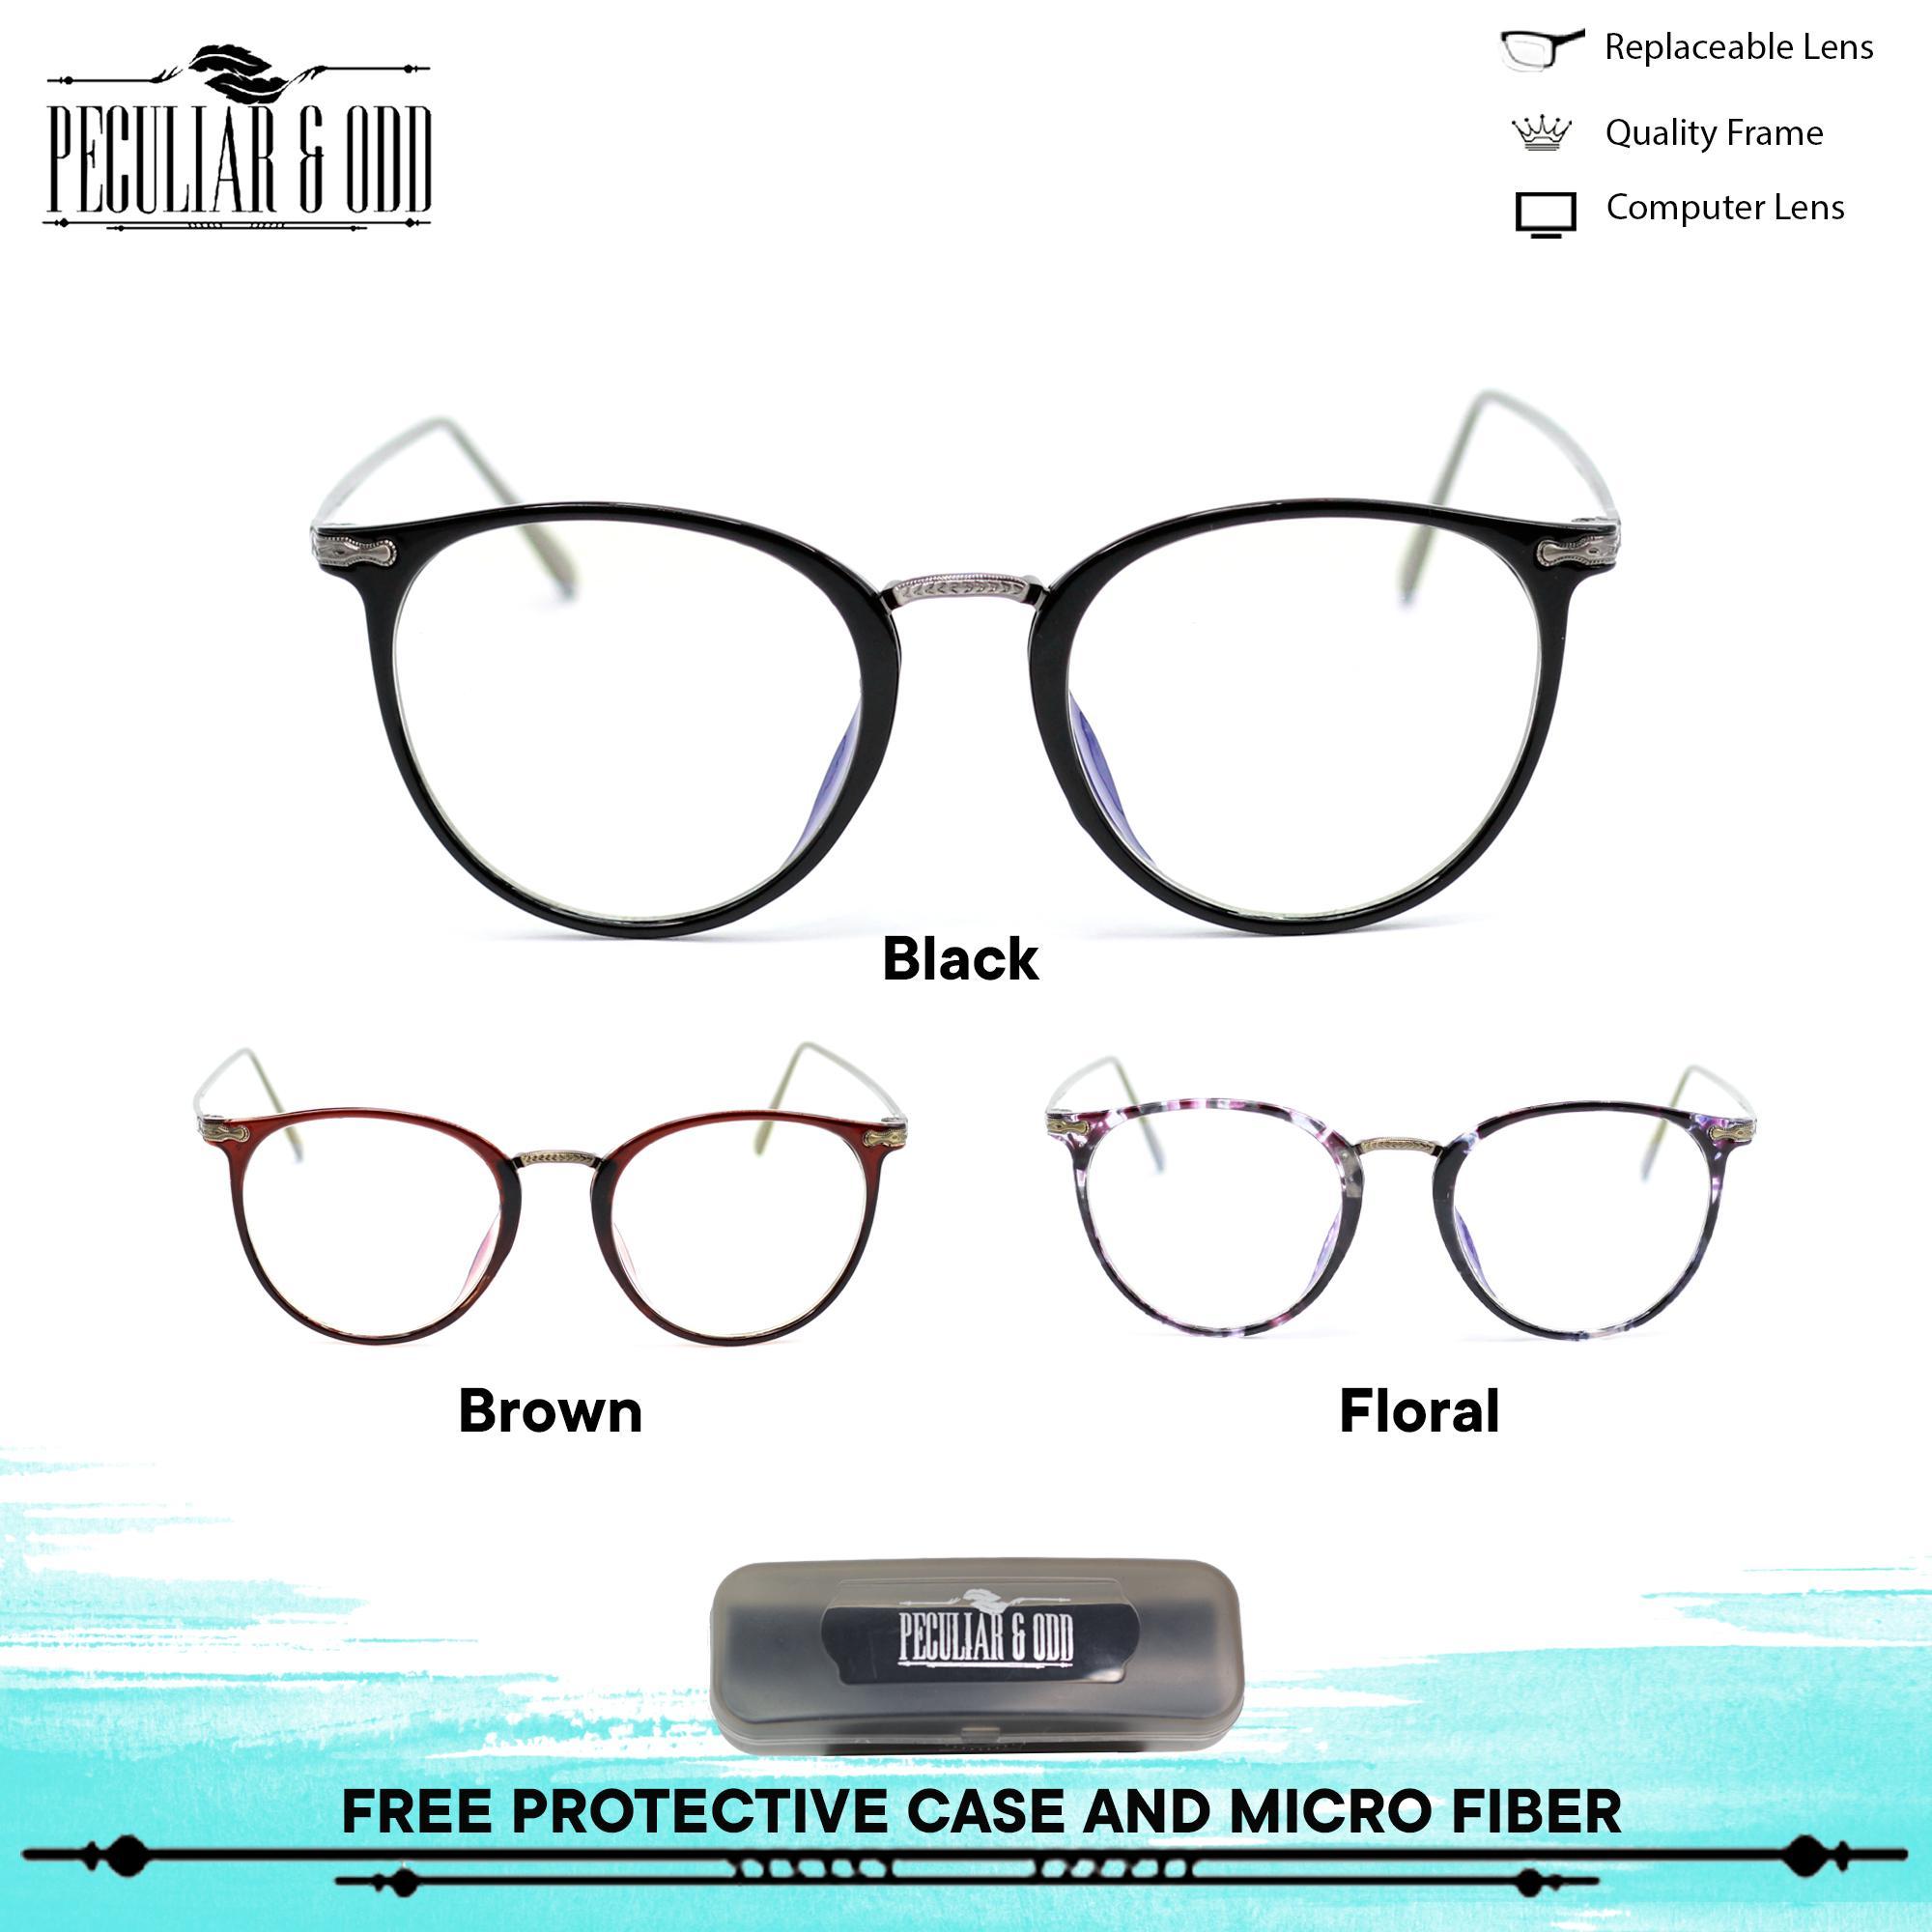 Peculiar Round Eyeglasses 8806 Antiradiation Lenses Lightweight Replaceable  Optical Lens Unisex Eyewear f66dbac4b778